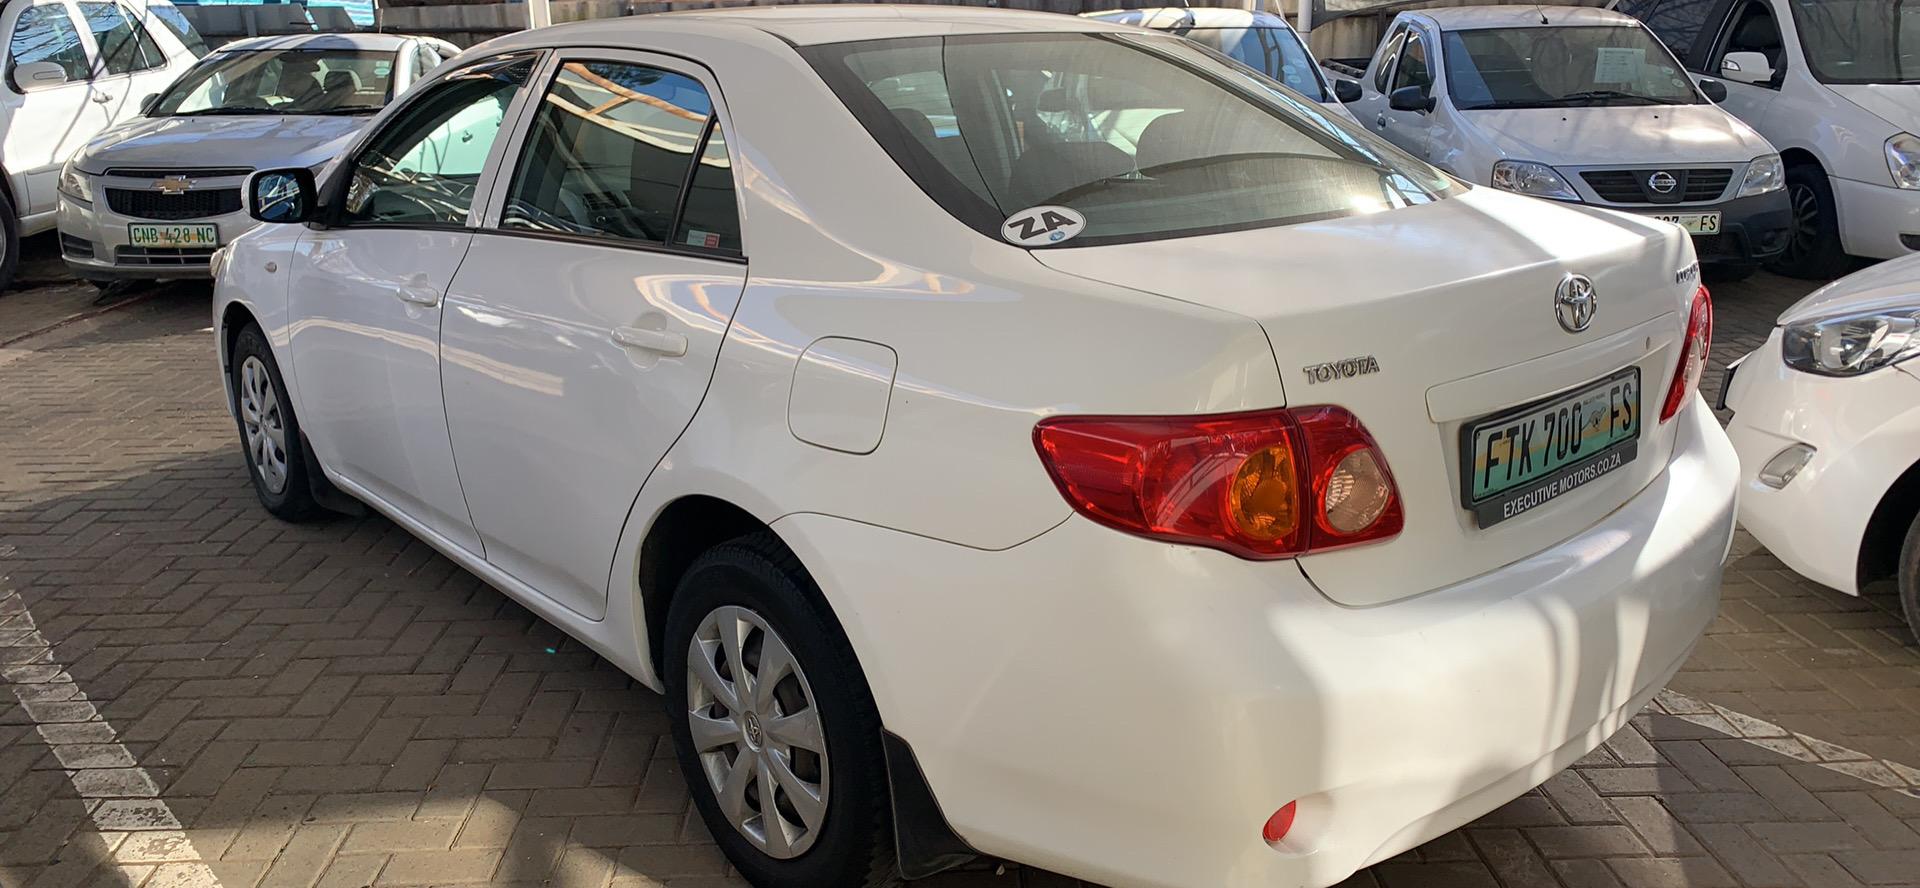 2009 Toyota Corolla 1.3 Professional